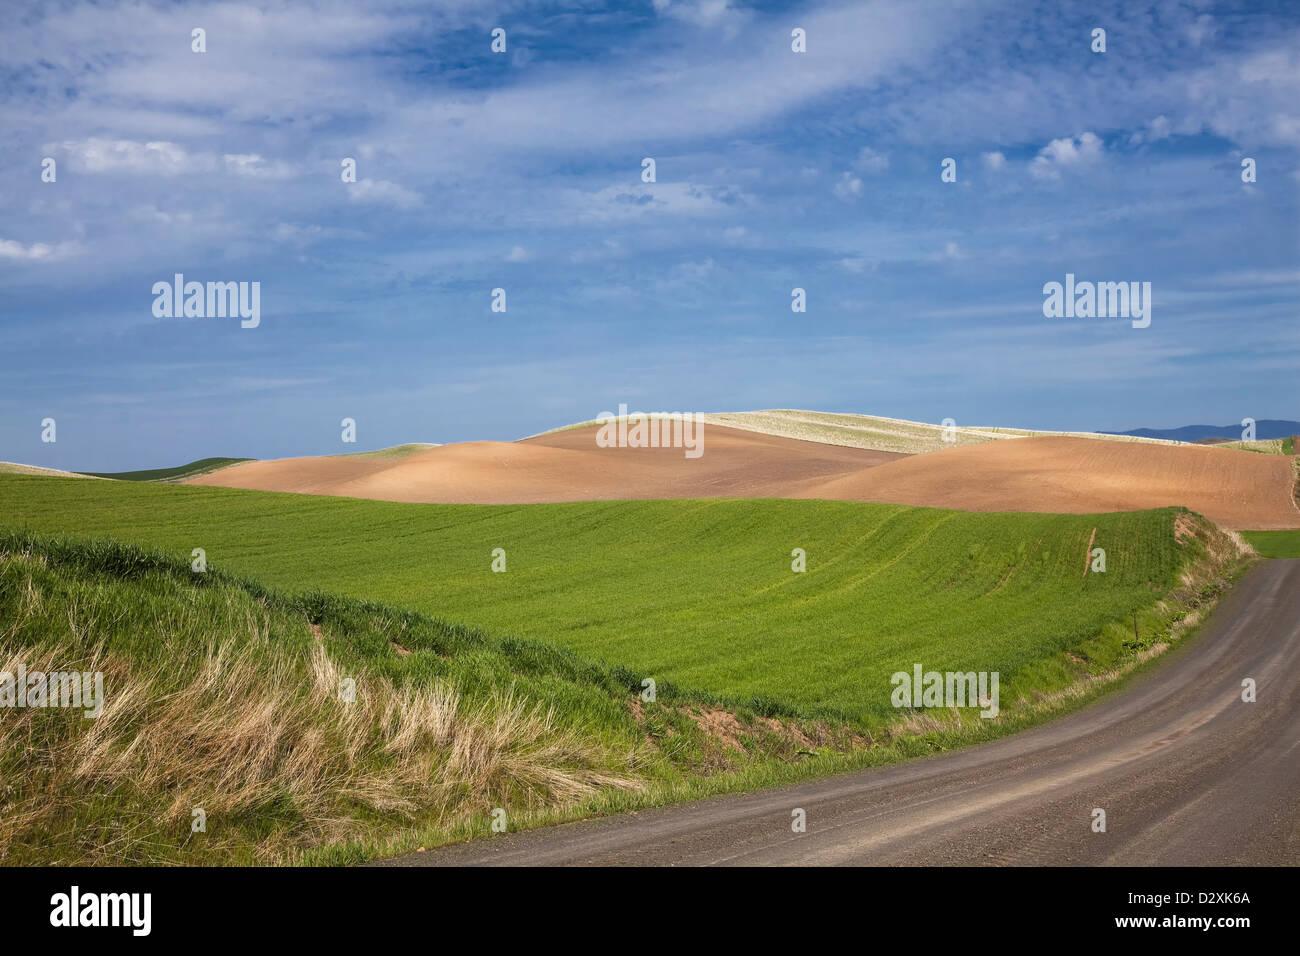 Road along rolling landscape - Stock Image